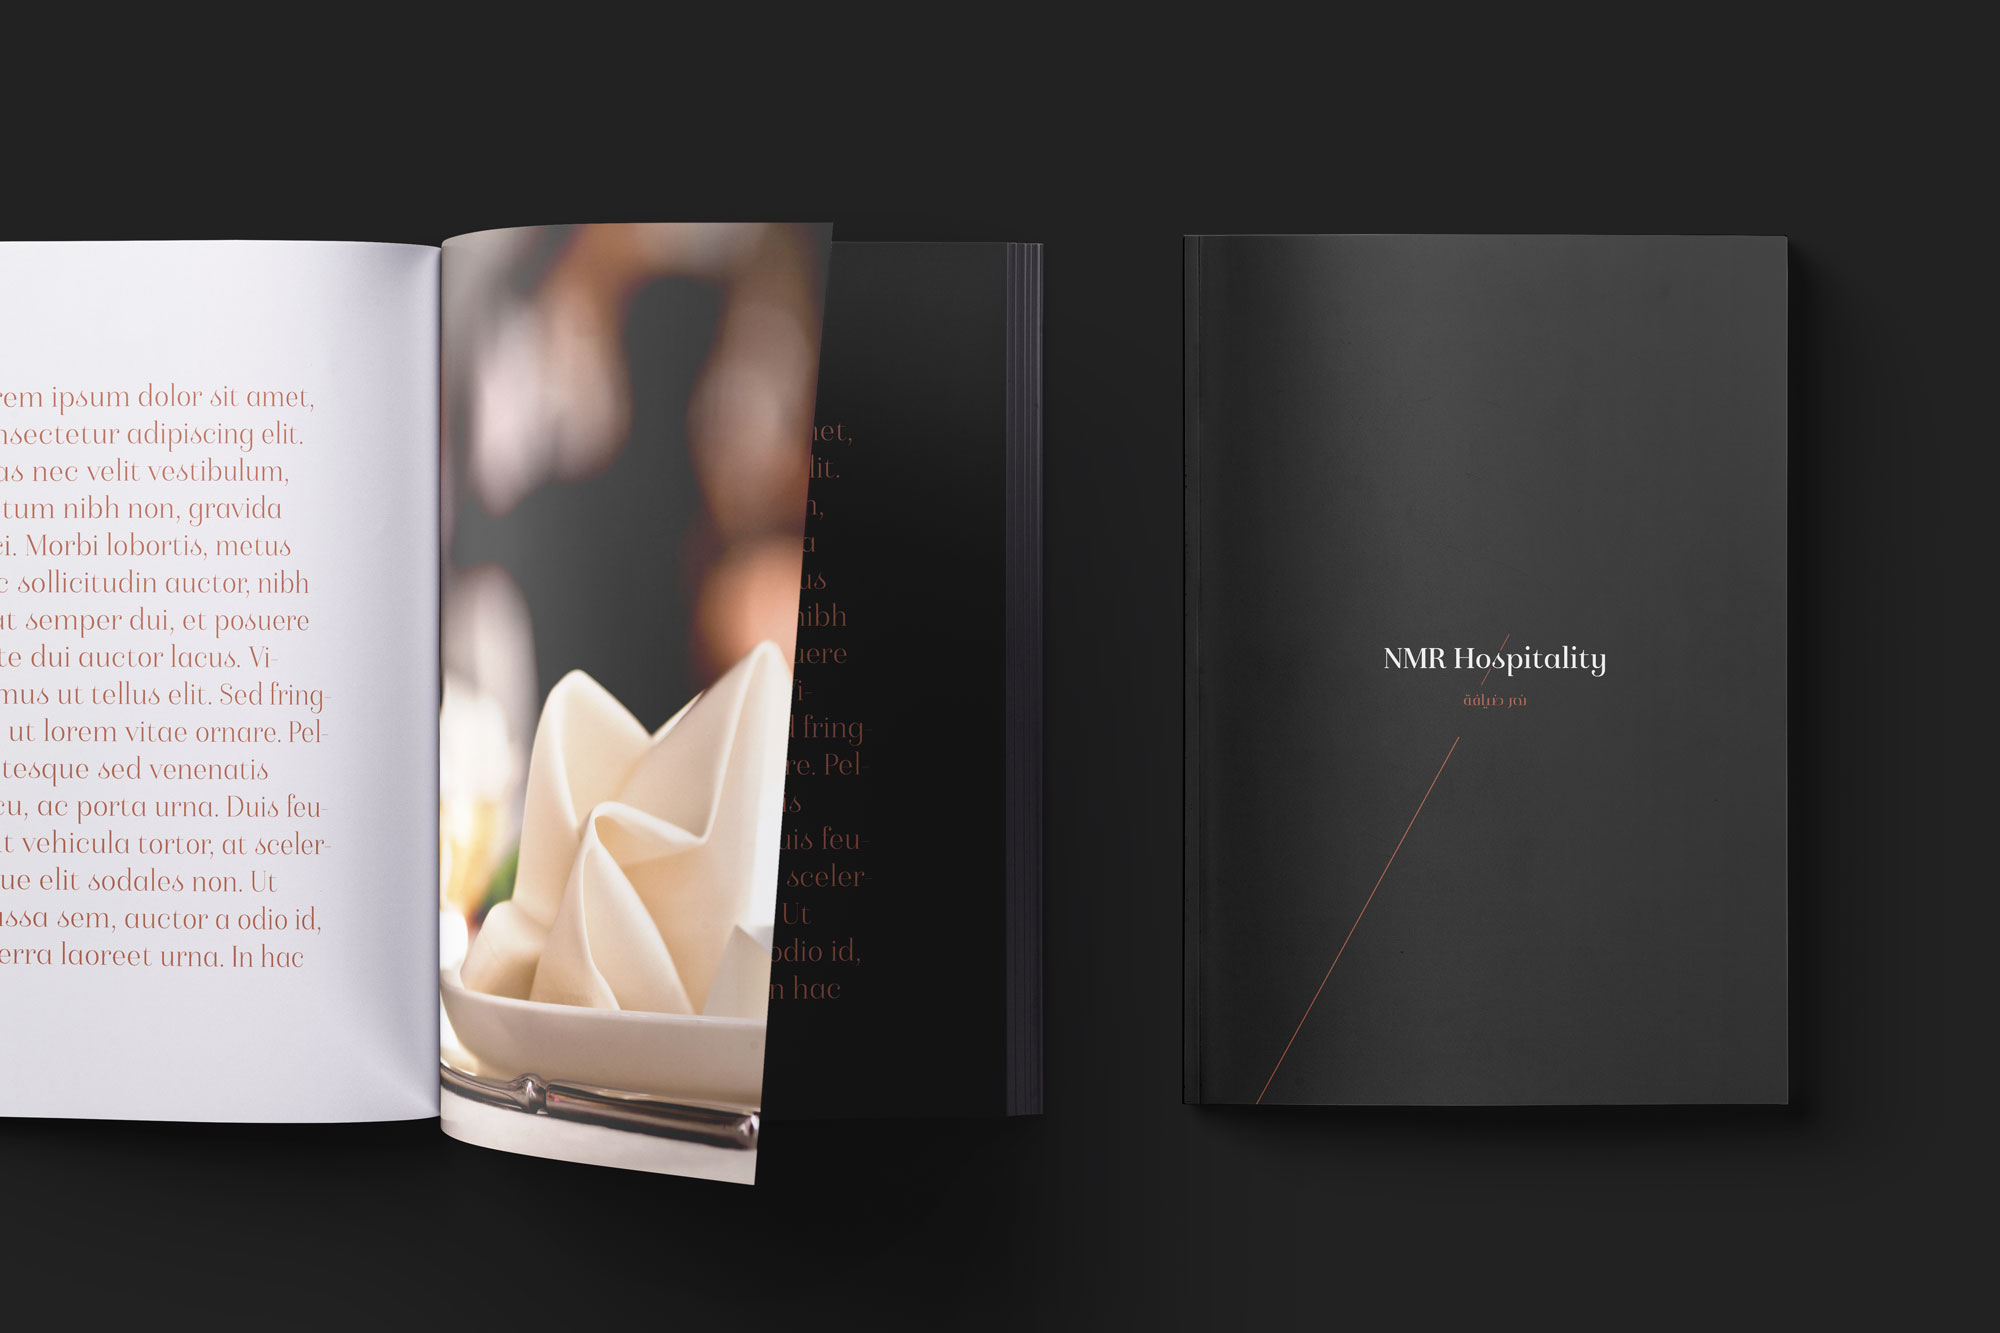 NMR_Hospitality_Profile_By_YaStudio